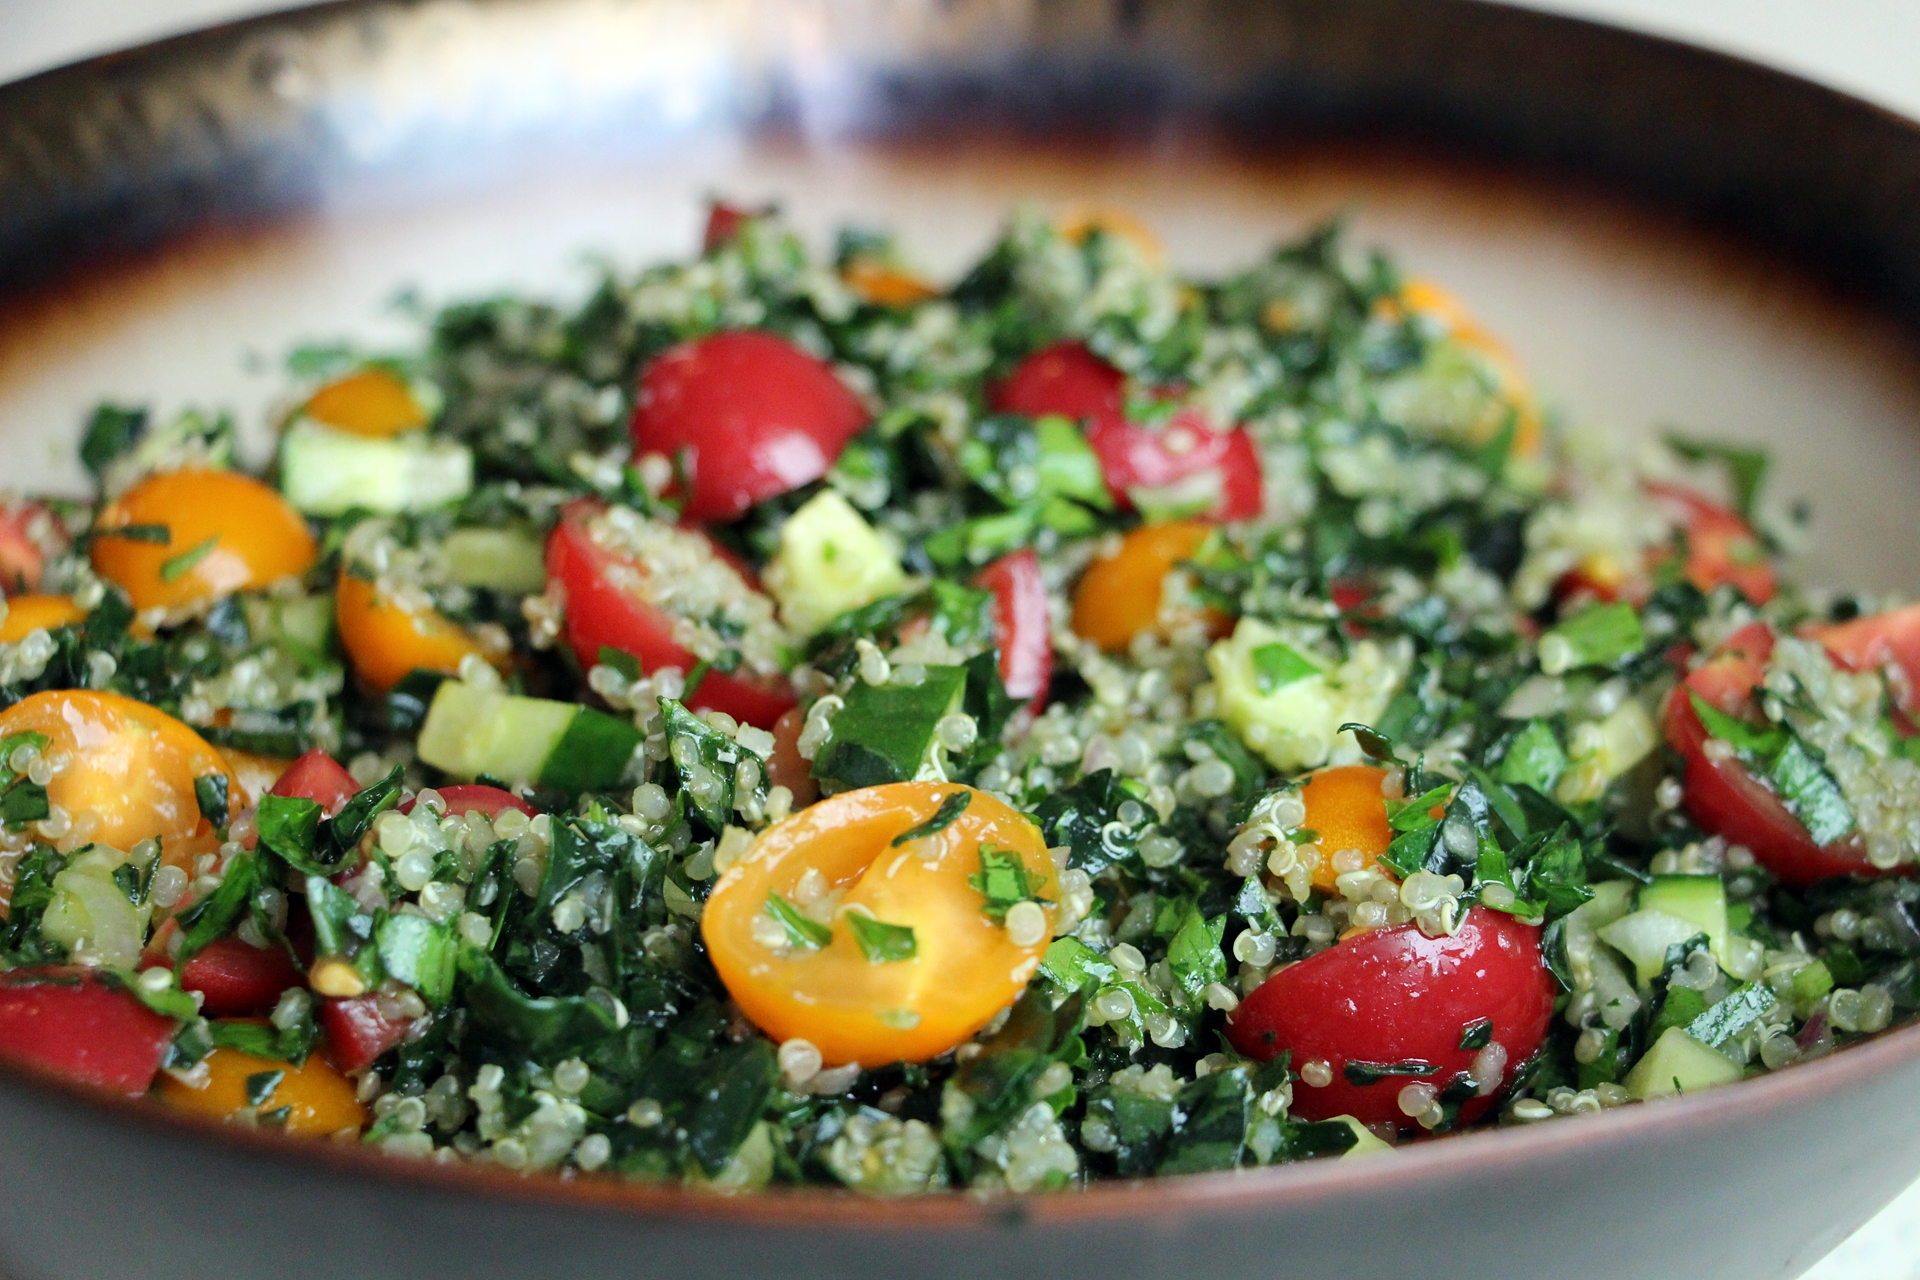 Grain-free Tabouli using Quinoa instead of Bulgar